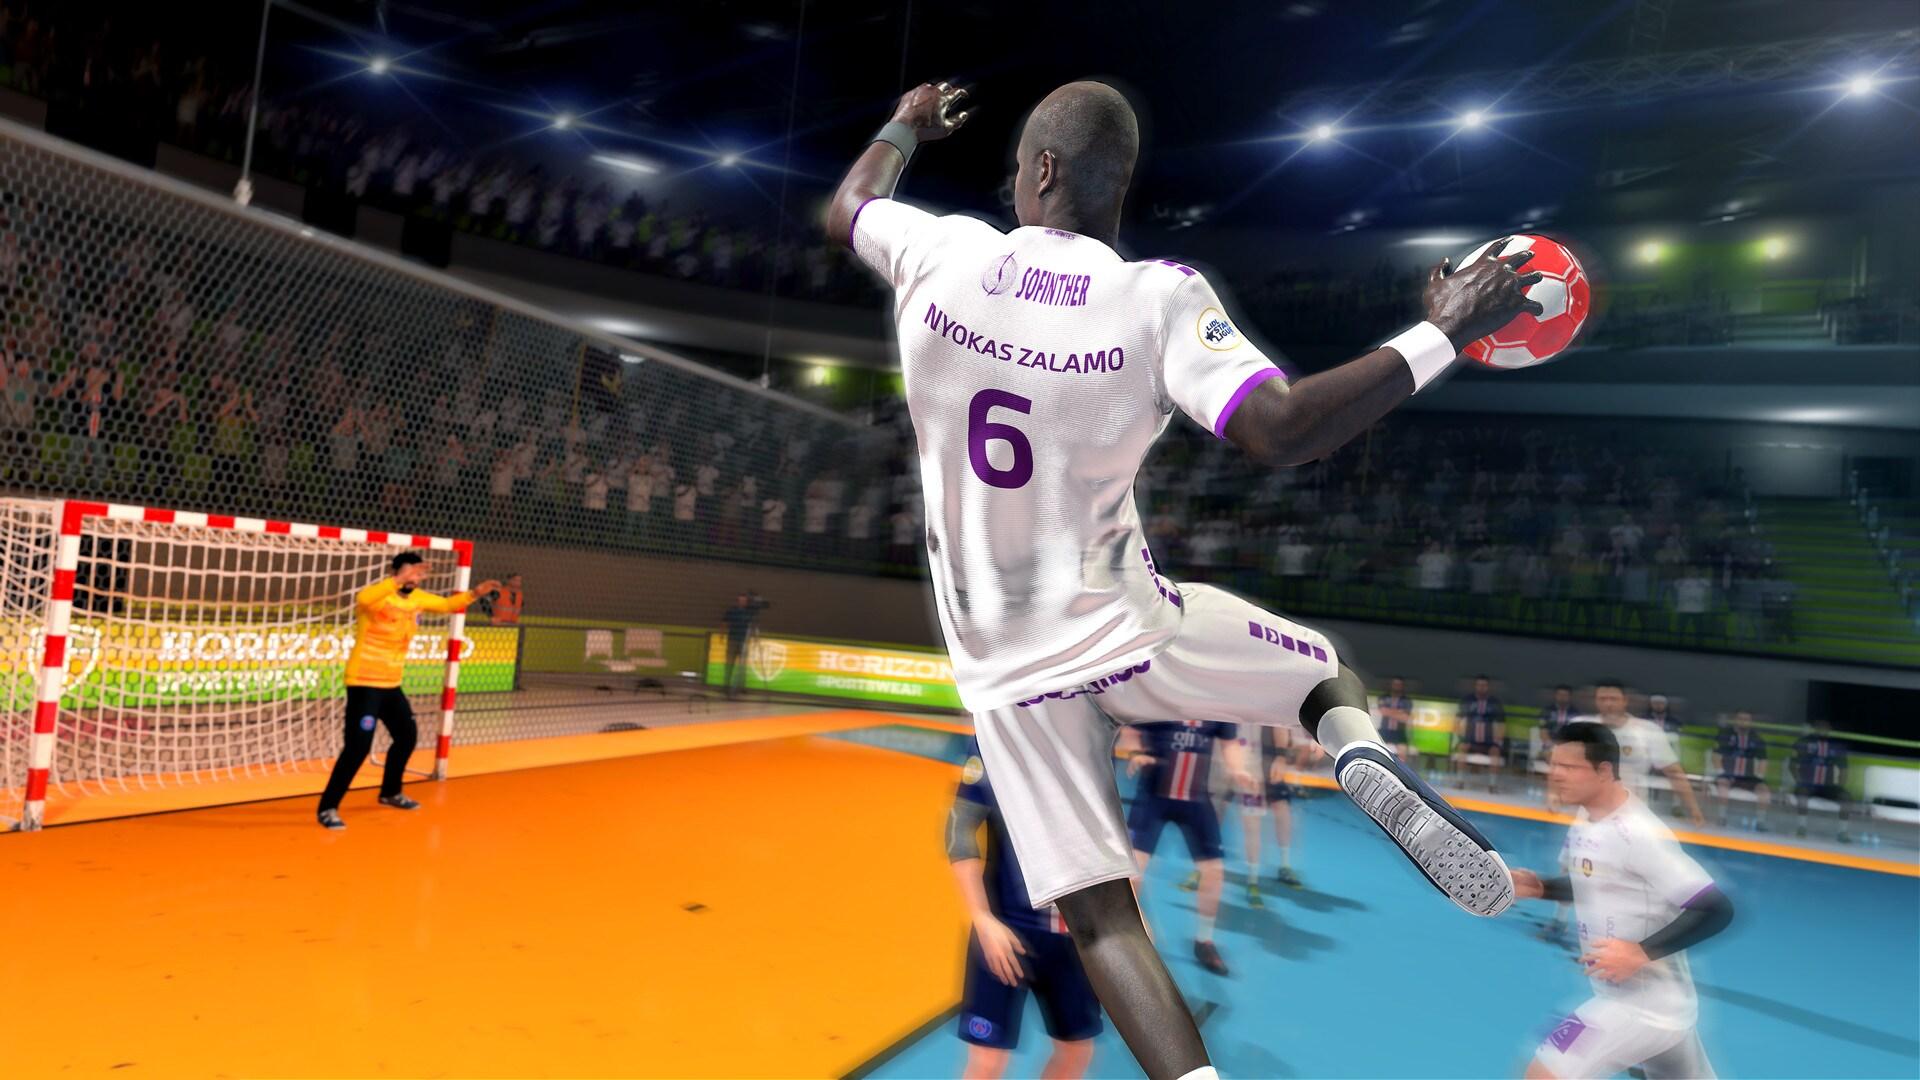 Handball 21 (PC) - Steam Gift - GLOBAL - 2